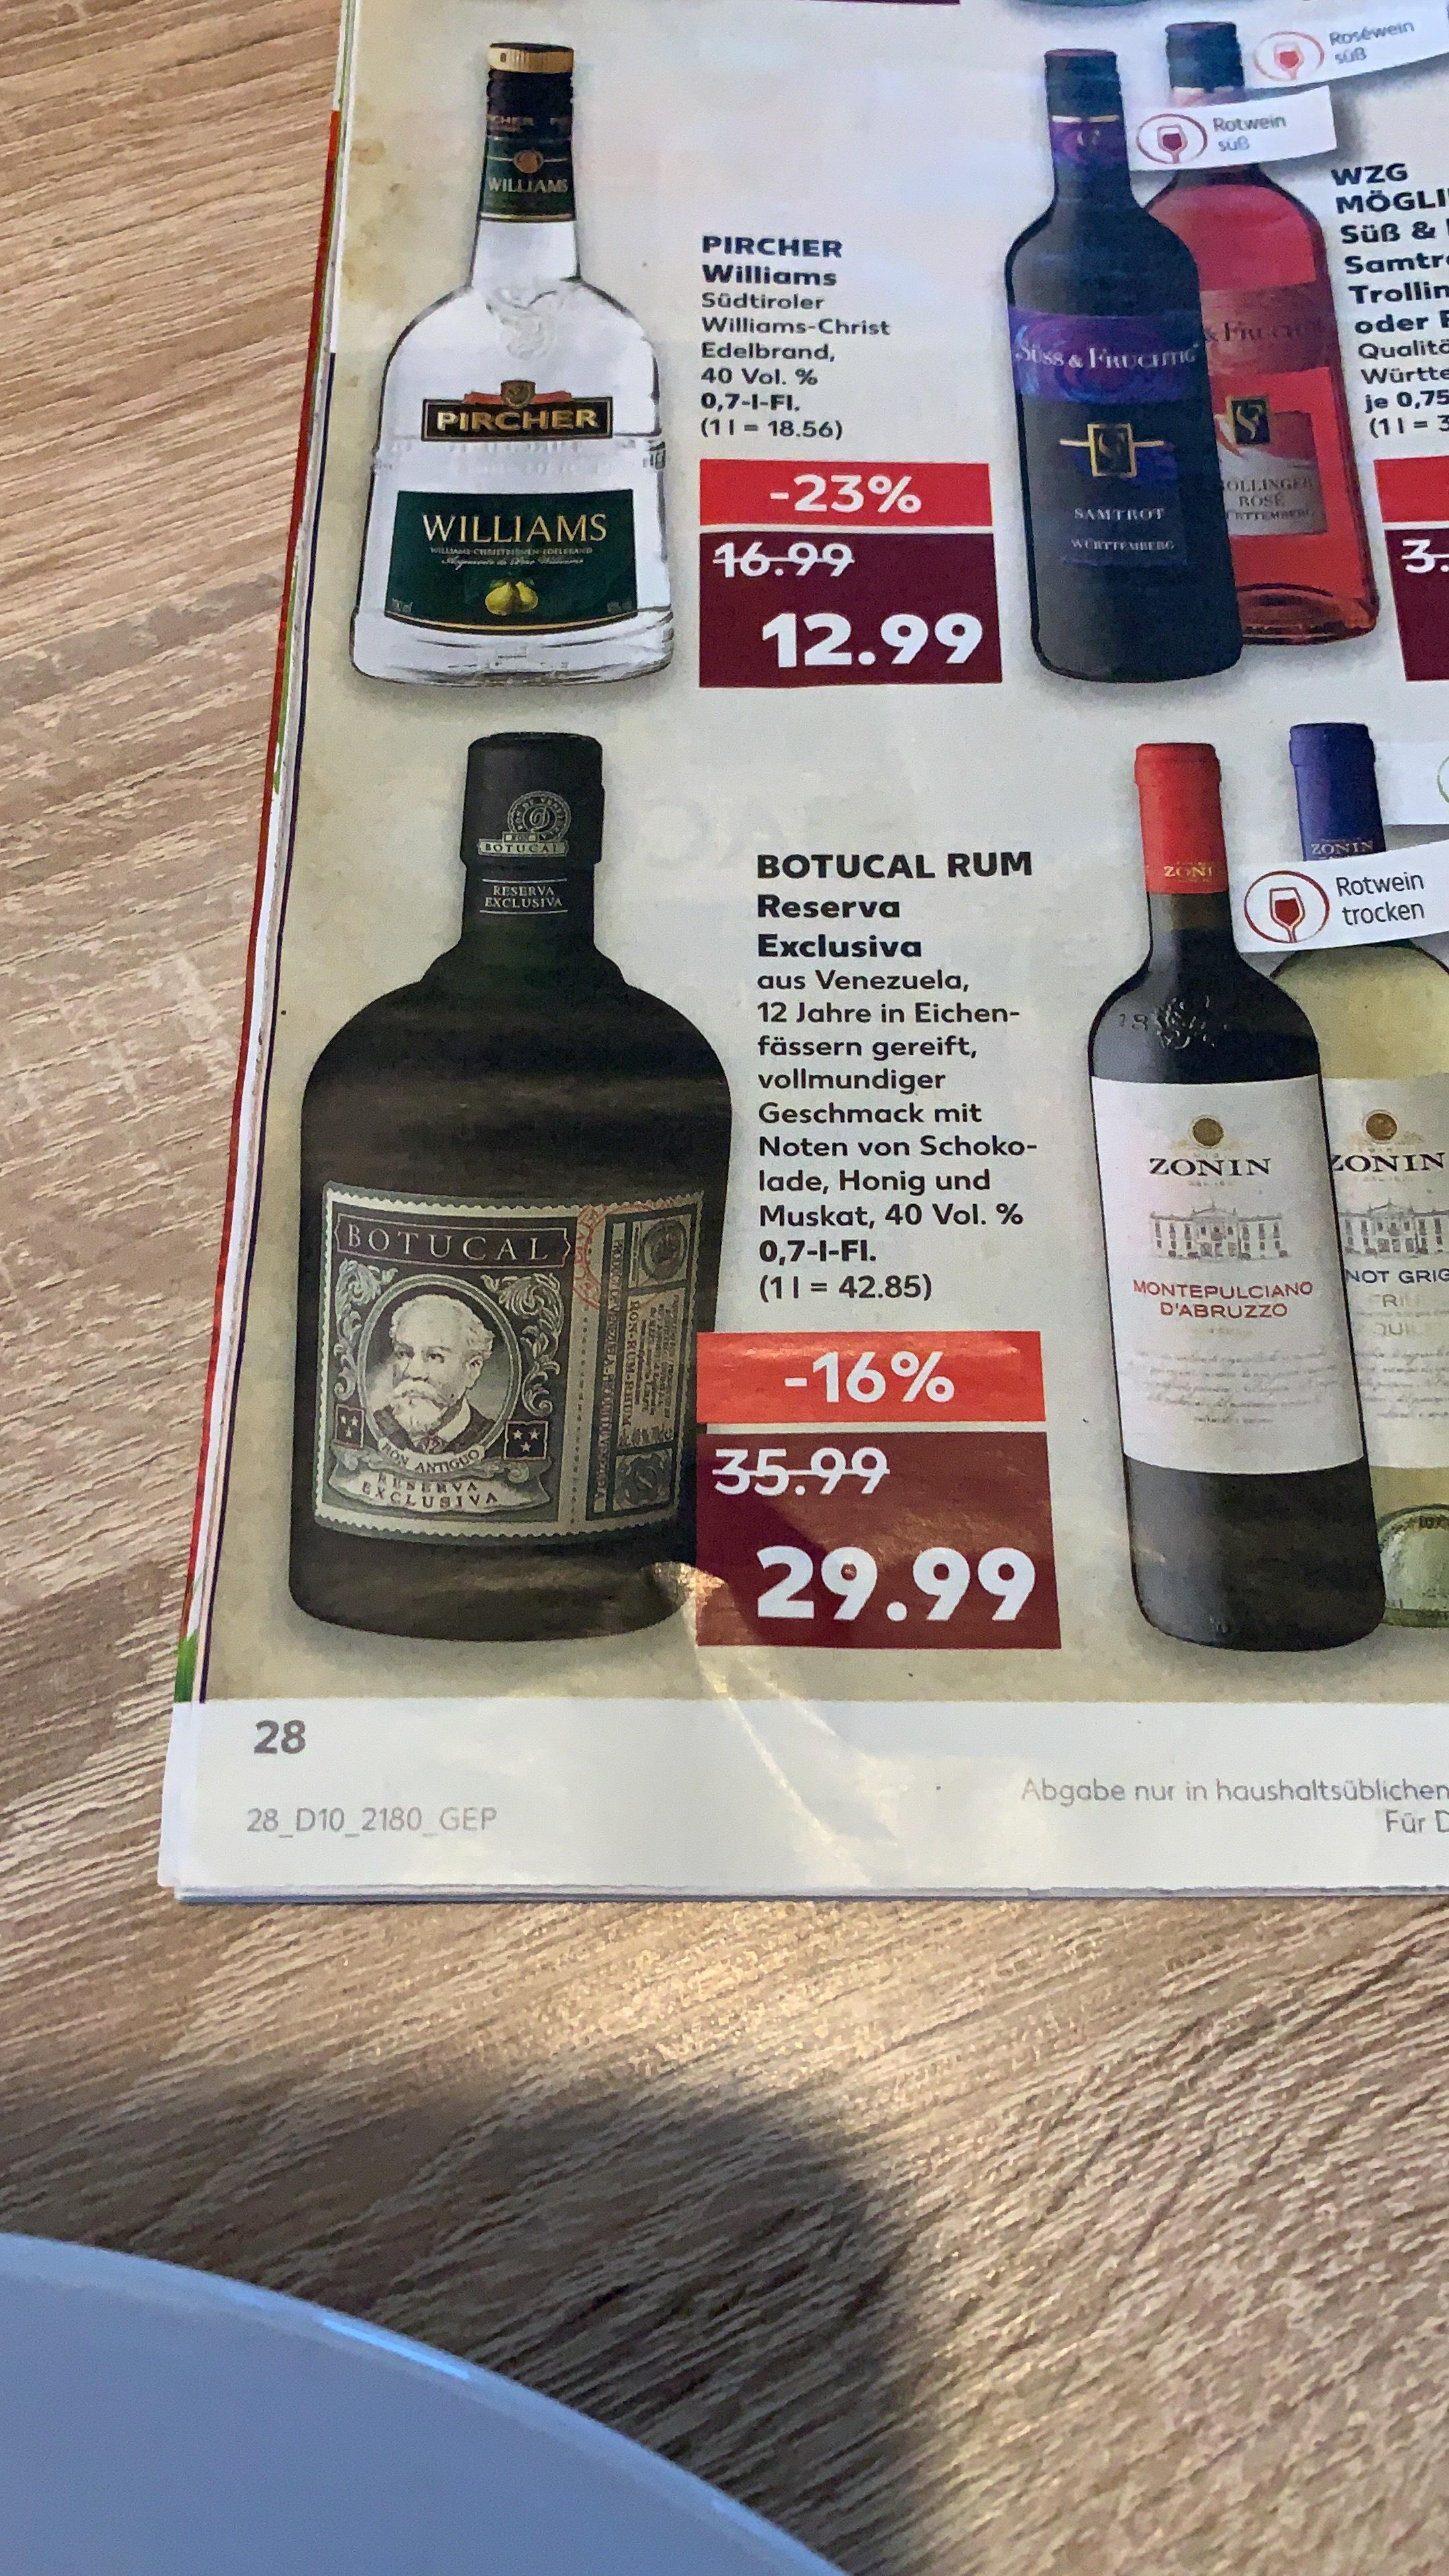 Botucal Rum im Angebot (Kaufland)